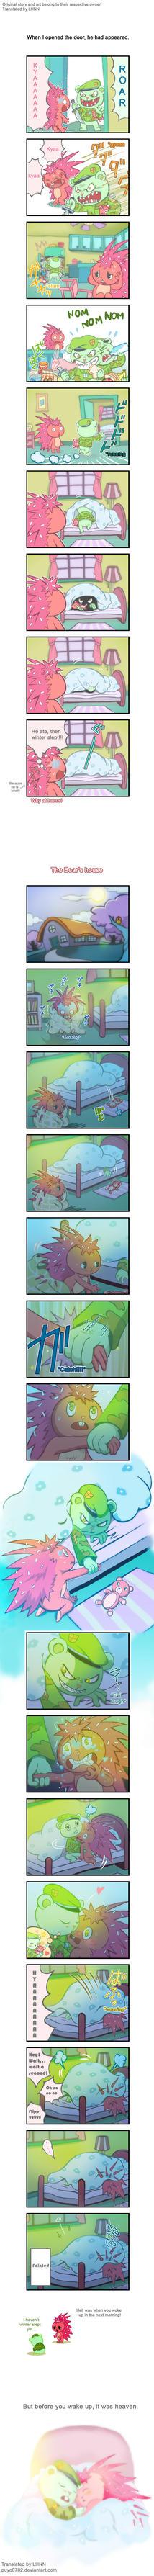 HTF doujinshi translation #7 by minglee7294